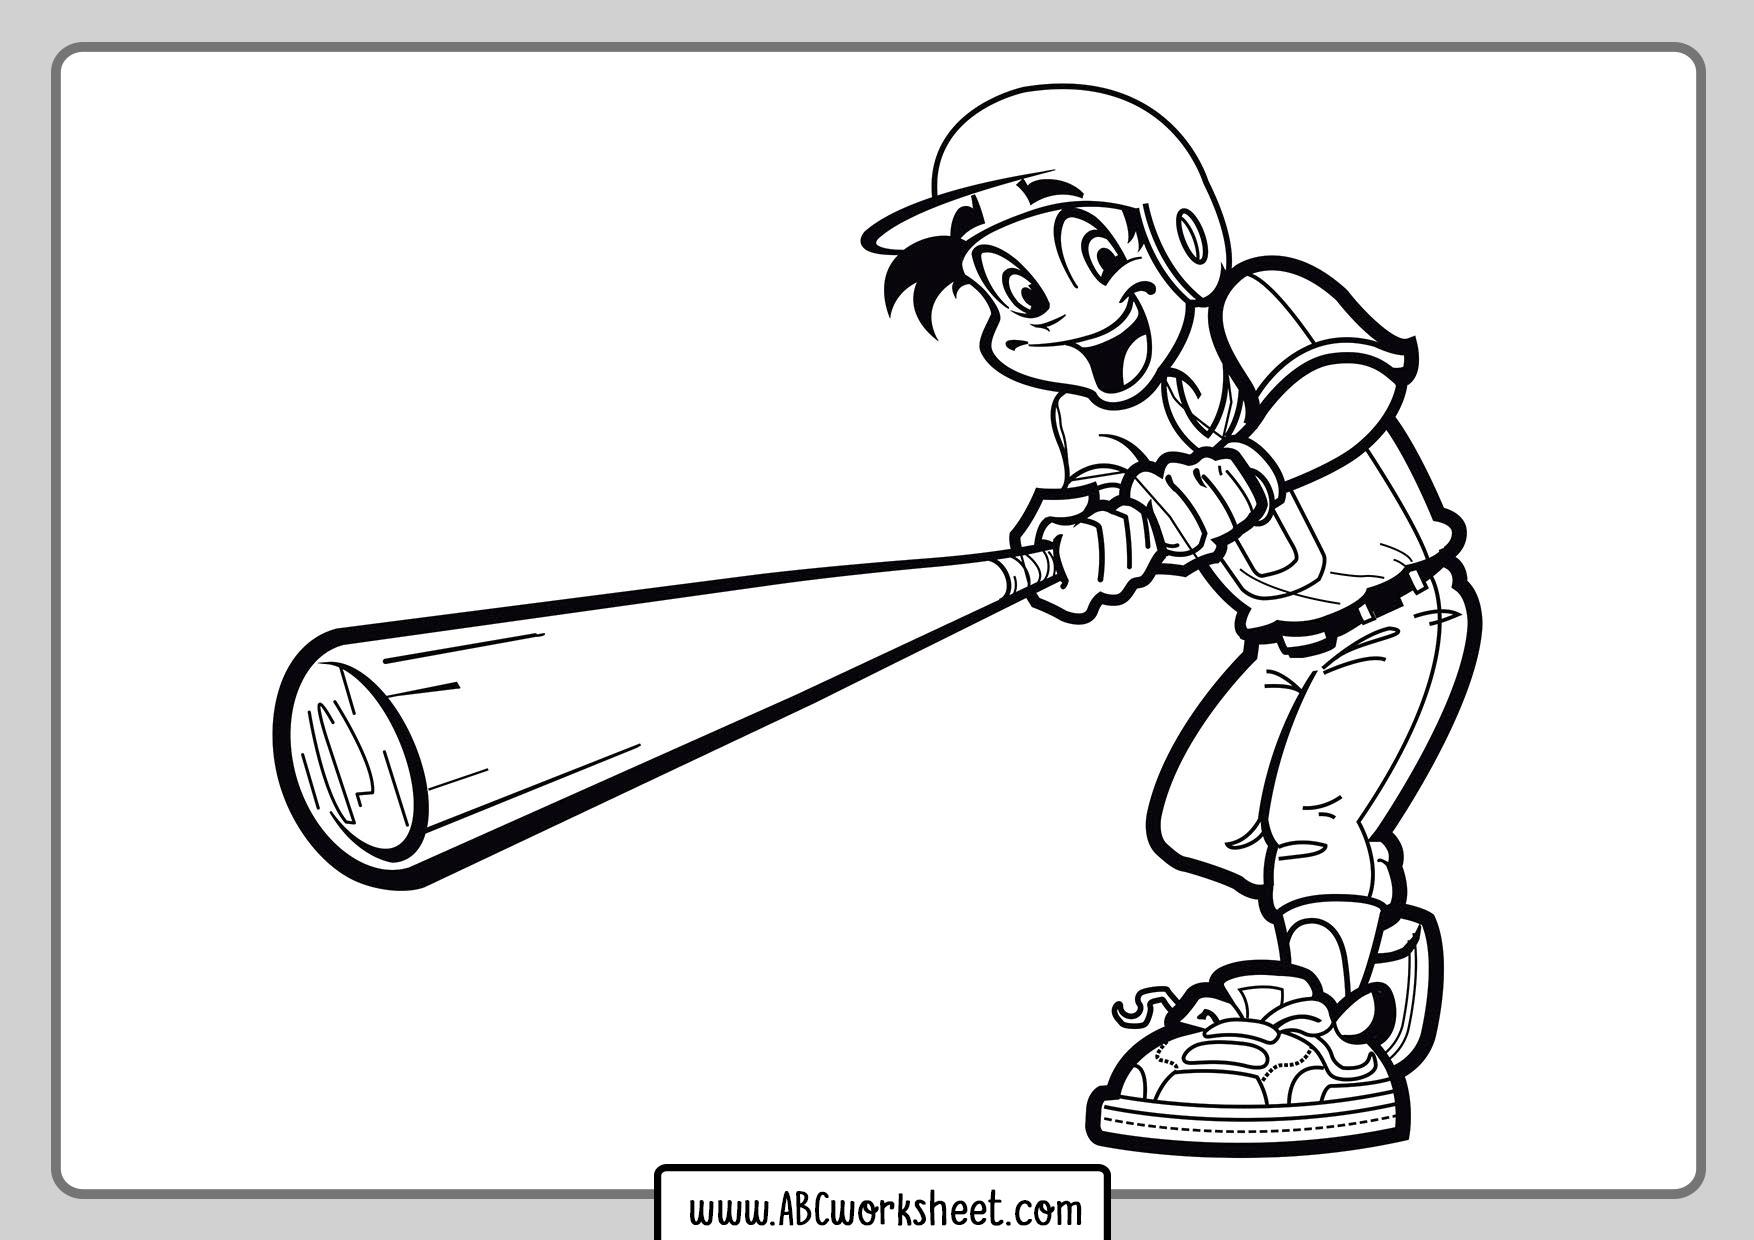 Baseball Player For Coloring